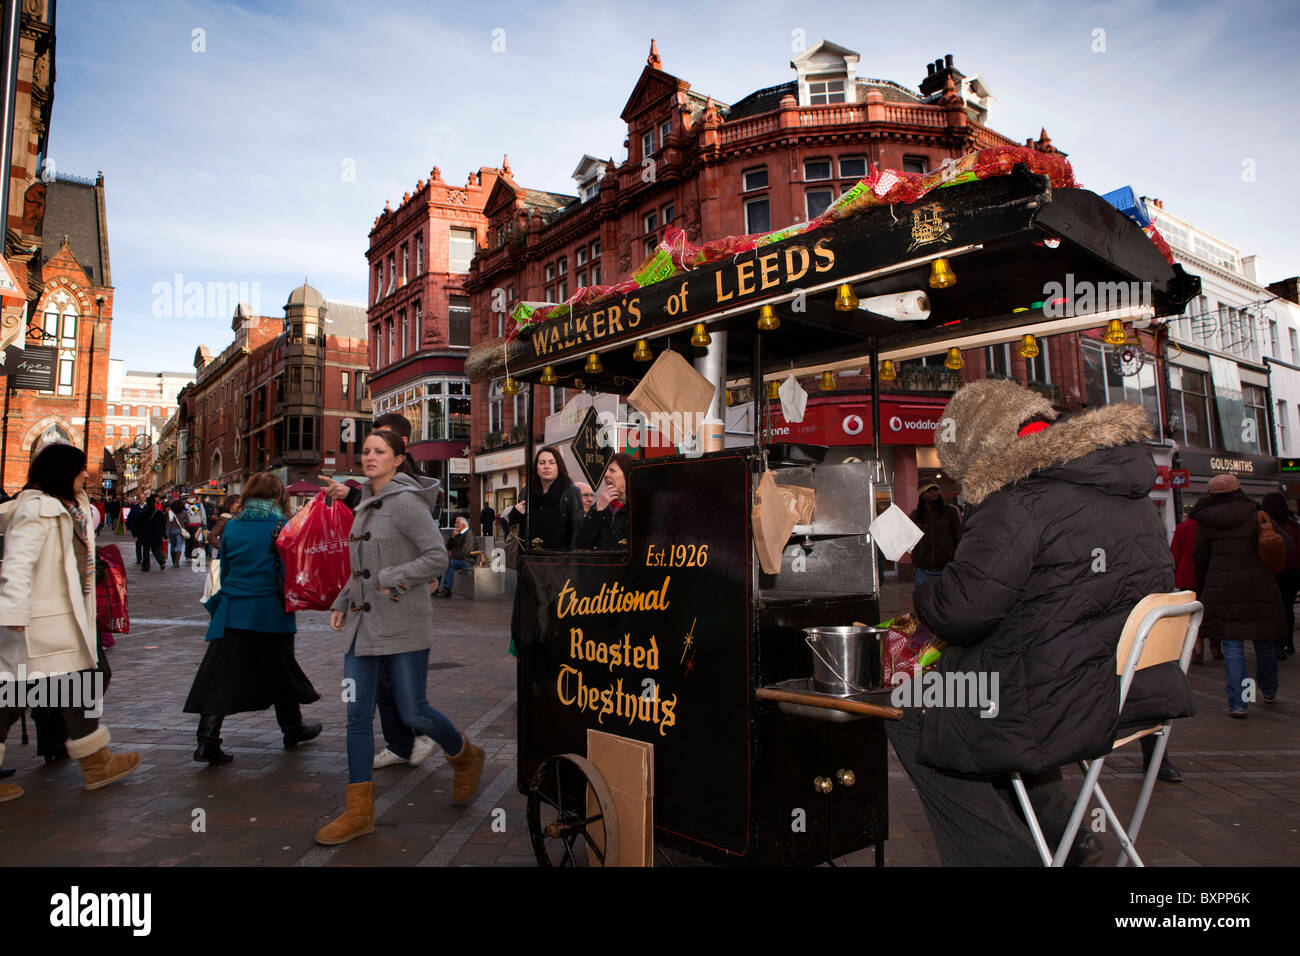 UK, England, Yorkshire, Leeds, Briggate, Walkers of Leeds traditional roasted chestnut vendor at Christmas - Stock Image